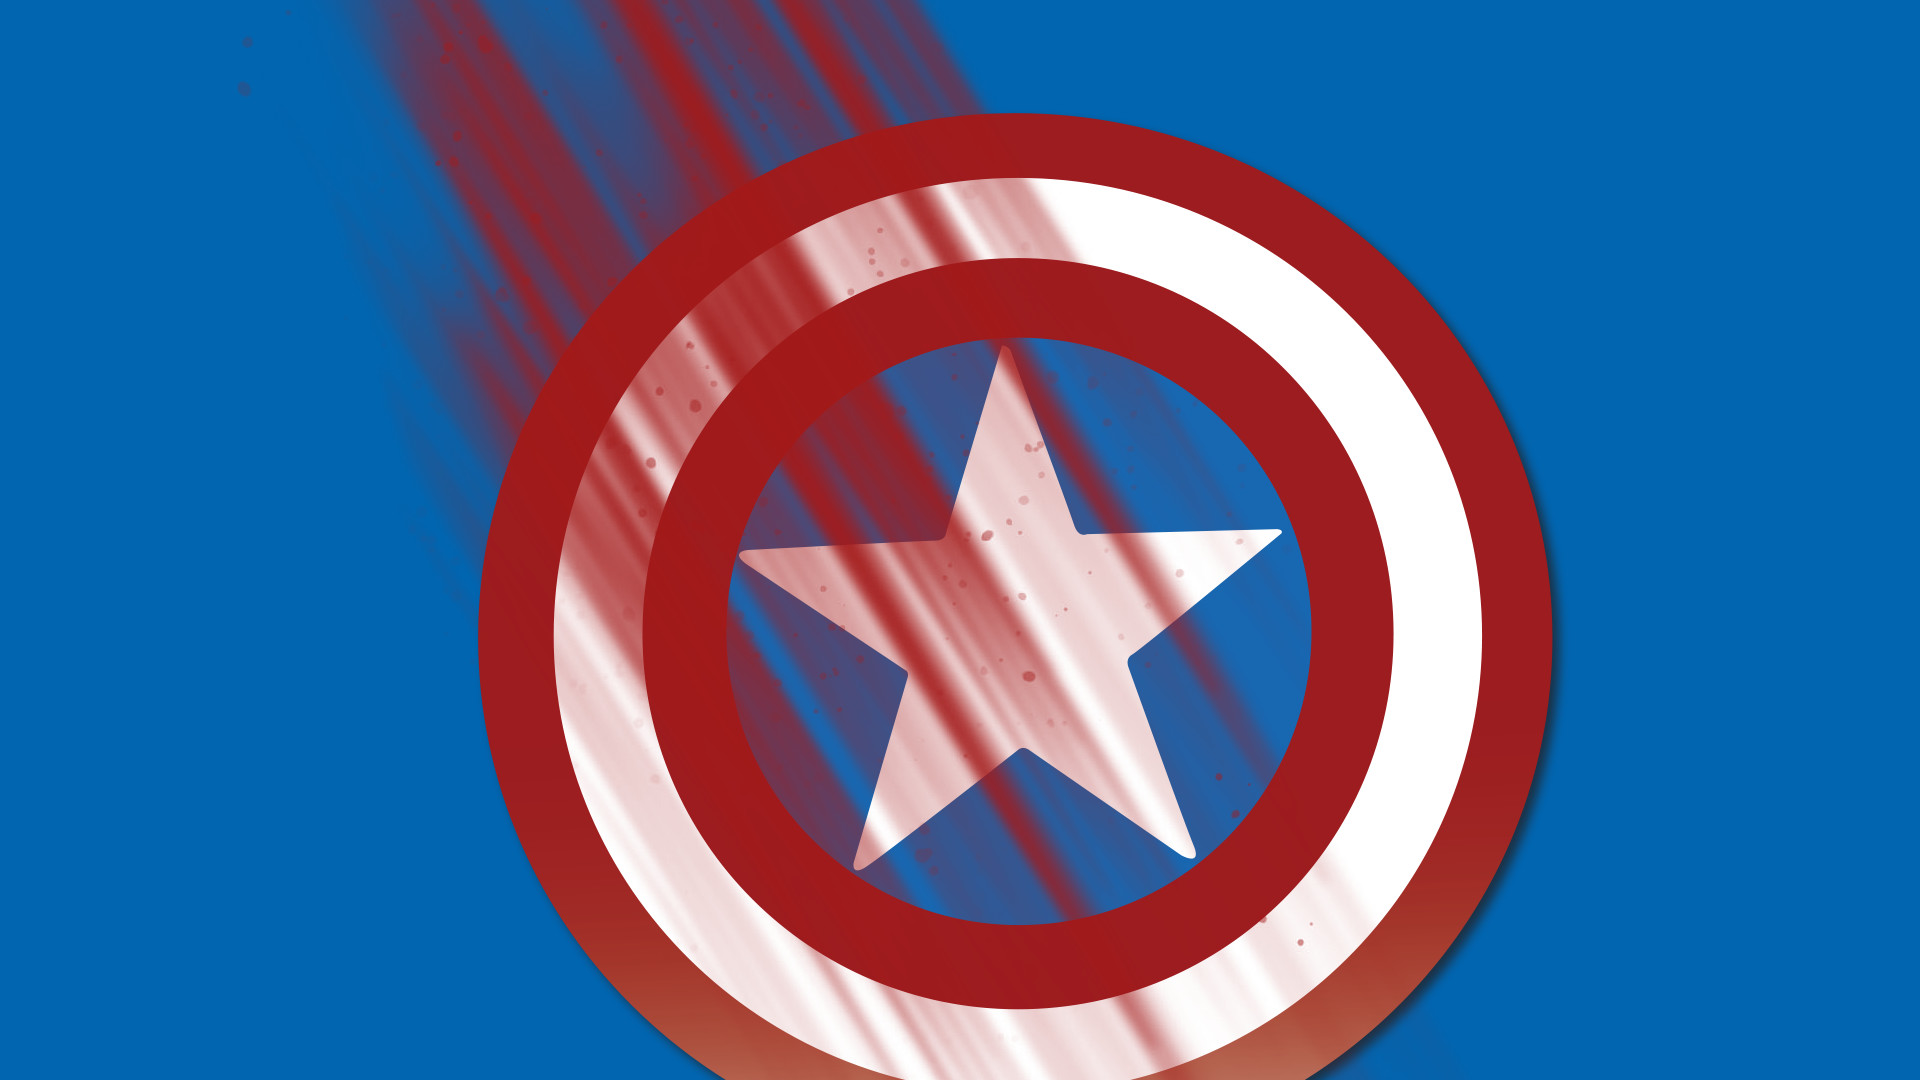 Comics – Captain America Wallpaper